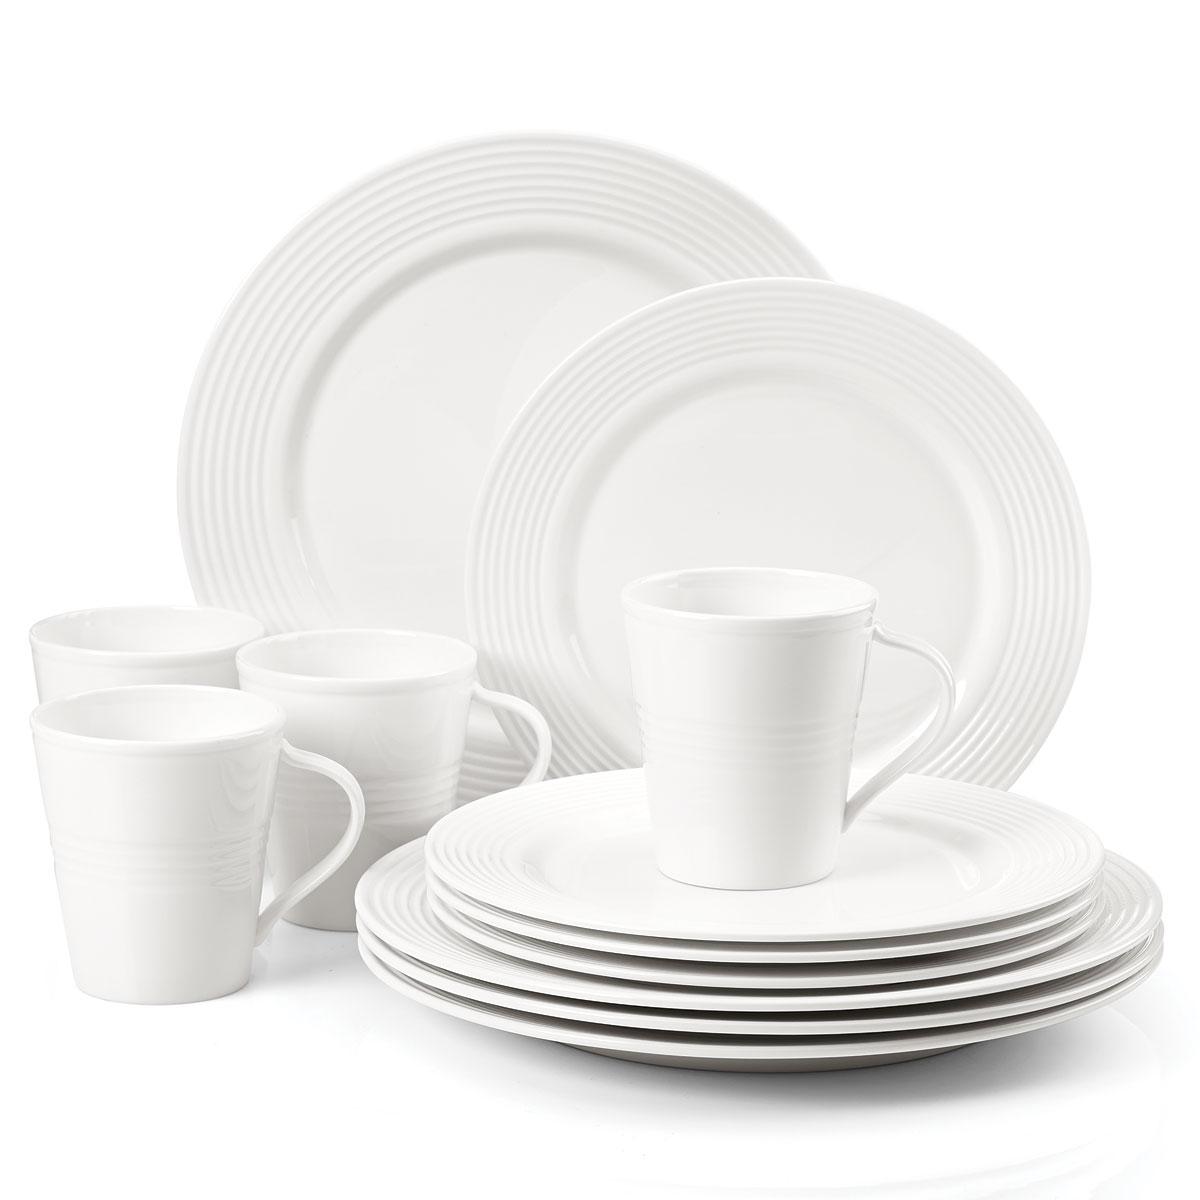 Lenox Tin Alley Dinnerware 7 Degree 12 Piece Set